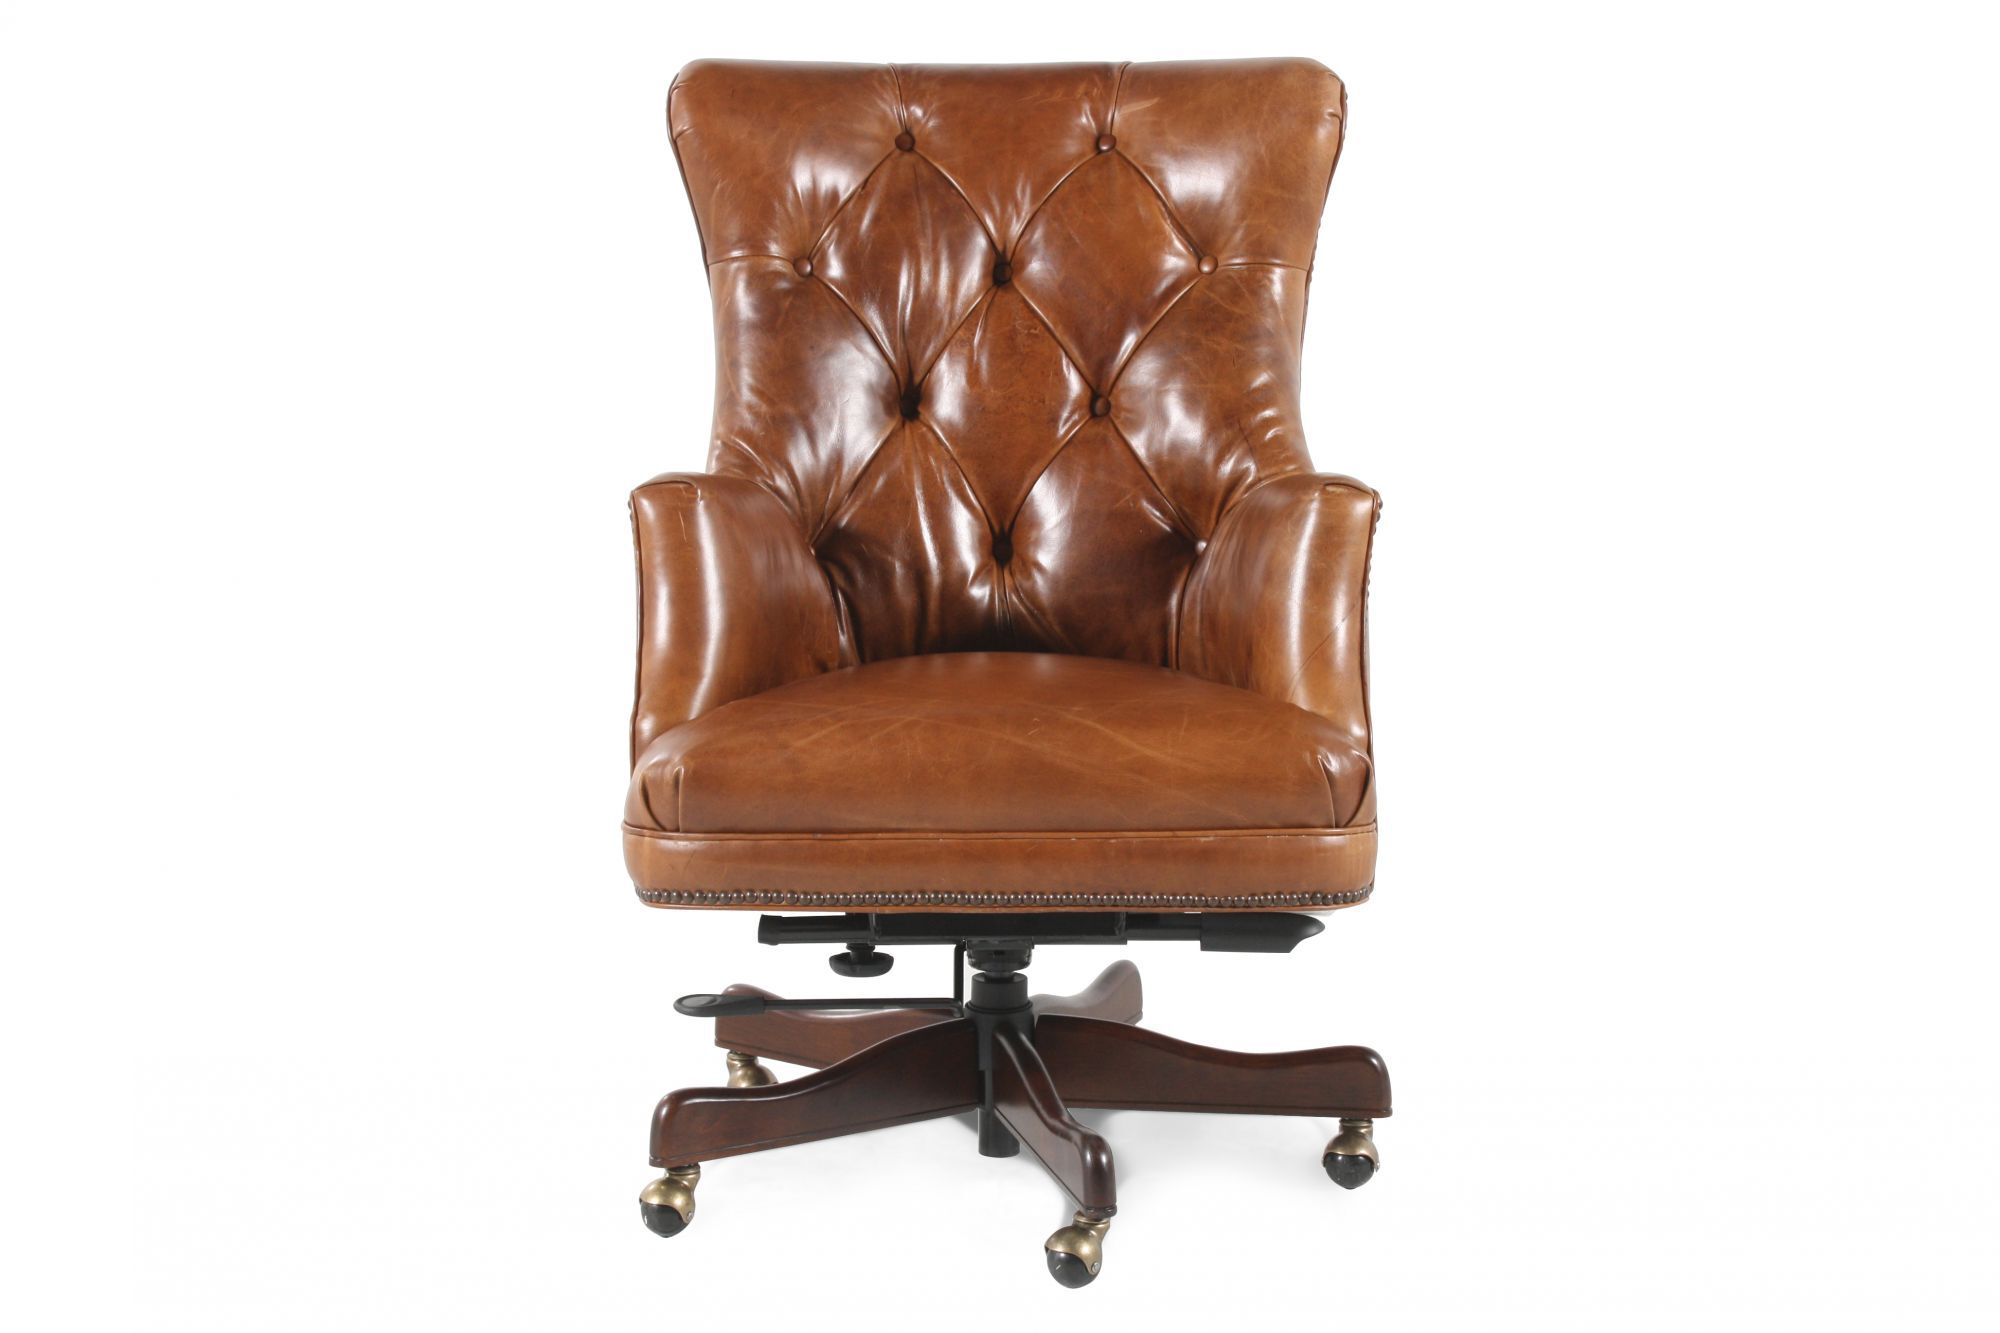 leather tufted executive swivel tilt chair in medium brown. Black Bedroom Furniture Sets. Home Design Ideas